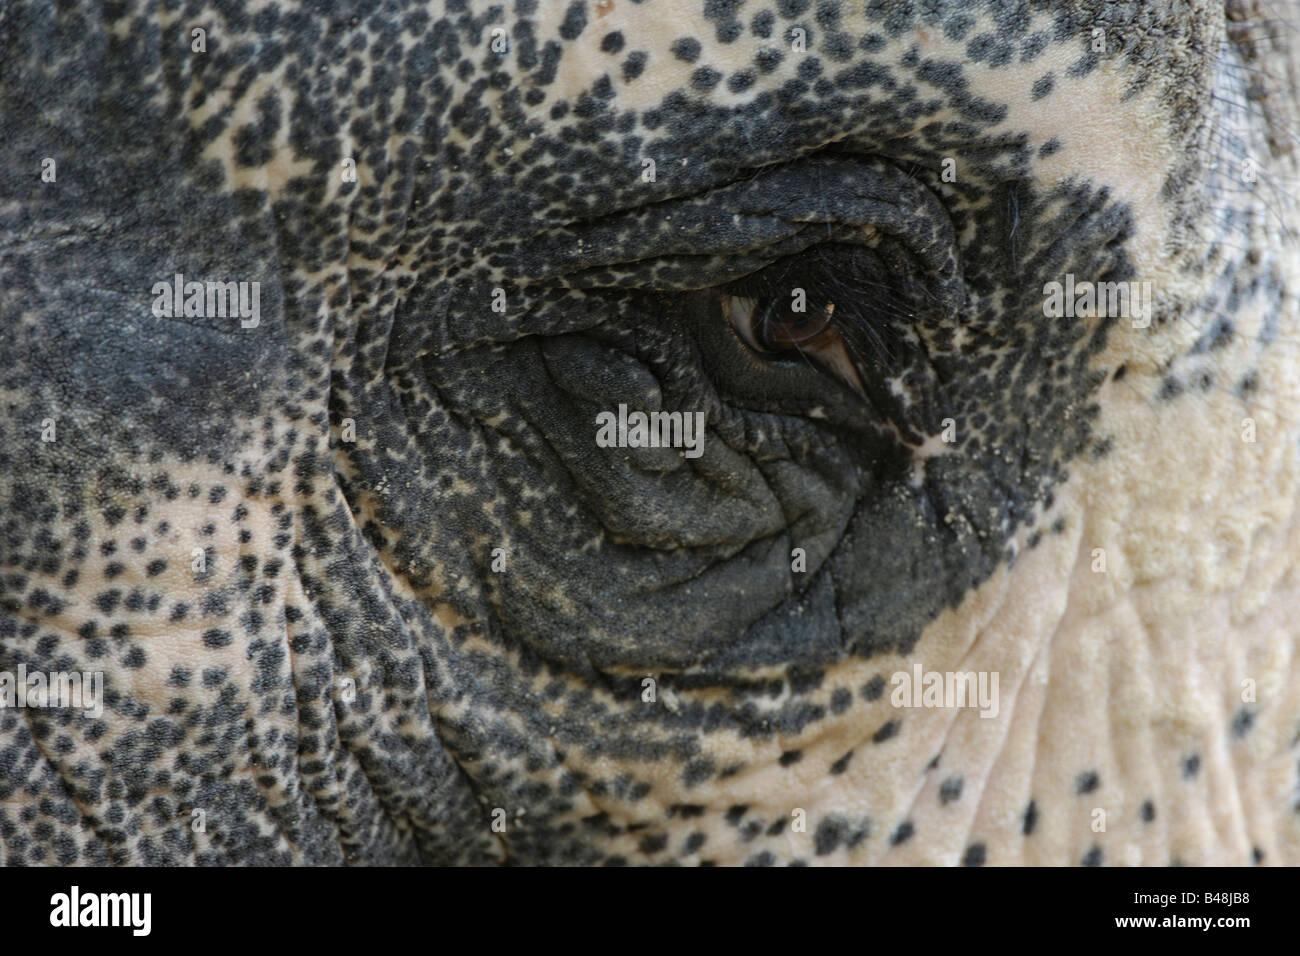 Auge eines Elefanten Asiatischen Oeil d'un éléphant d'Asie Elephas maximus Photo Stock